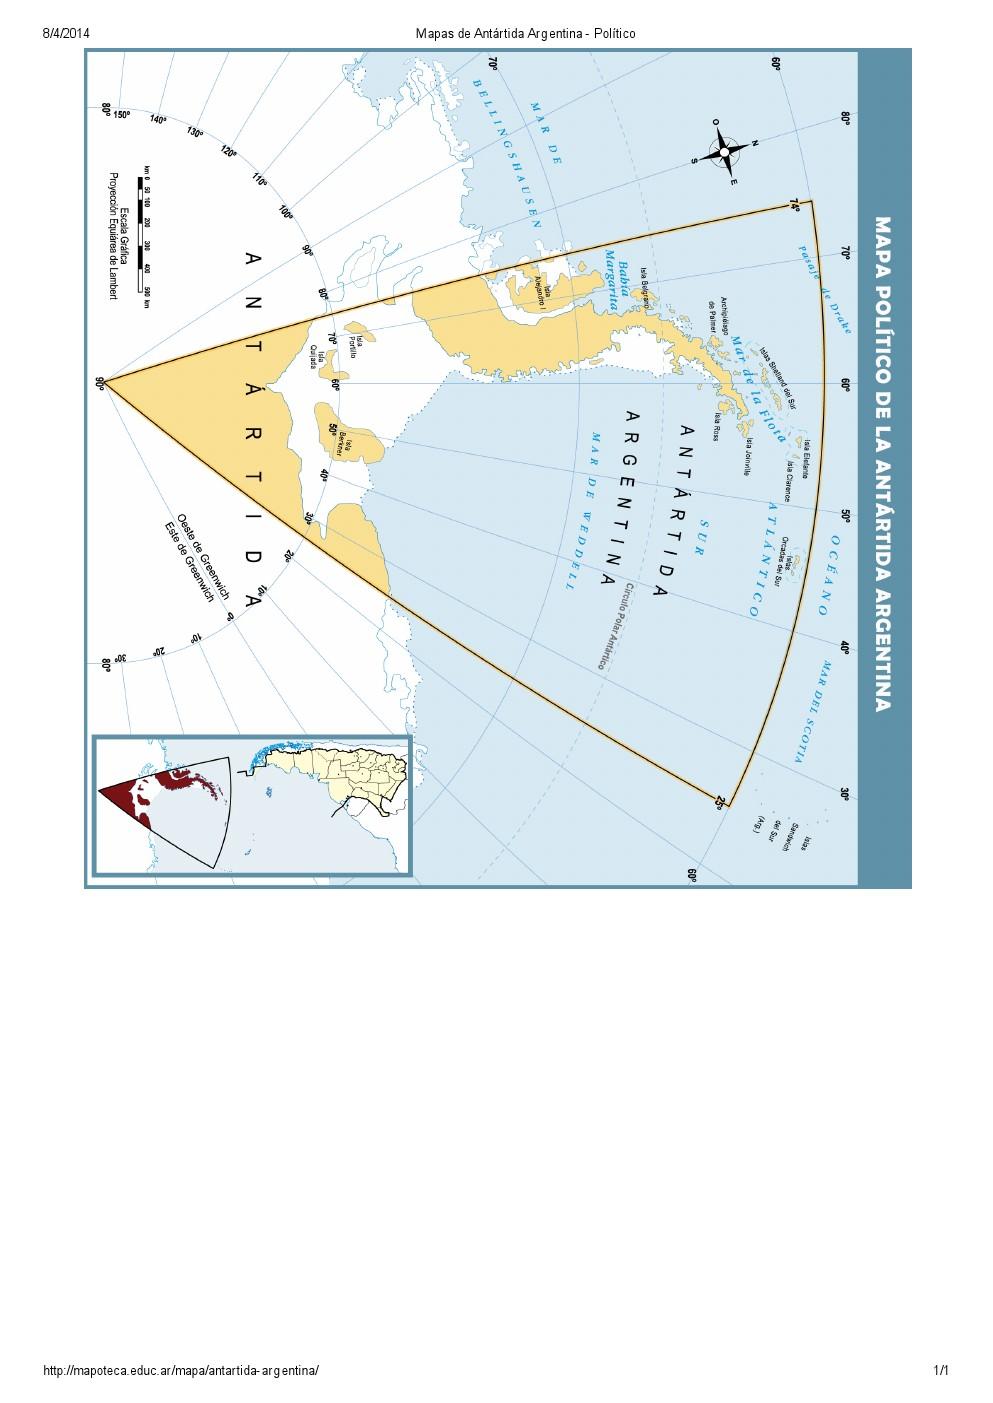 Mapa político de la Antártida Argentina. Mapoteca de Educ.ar